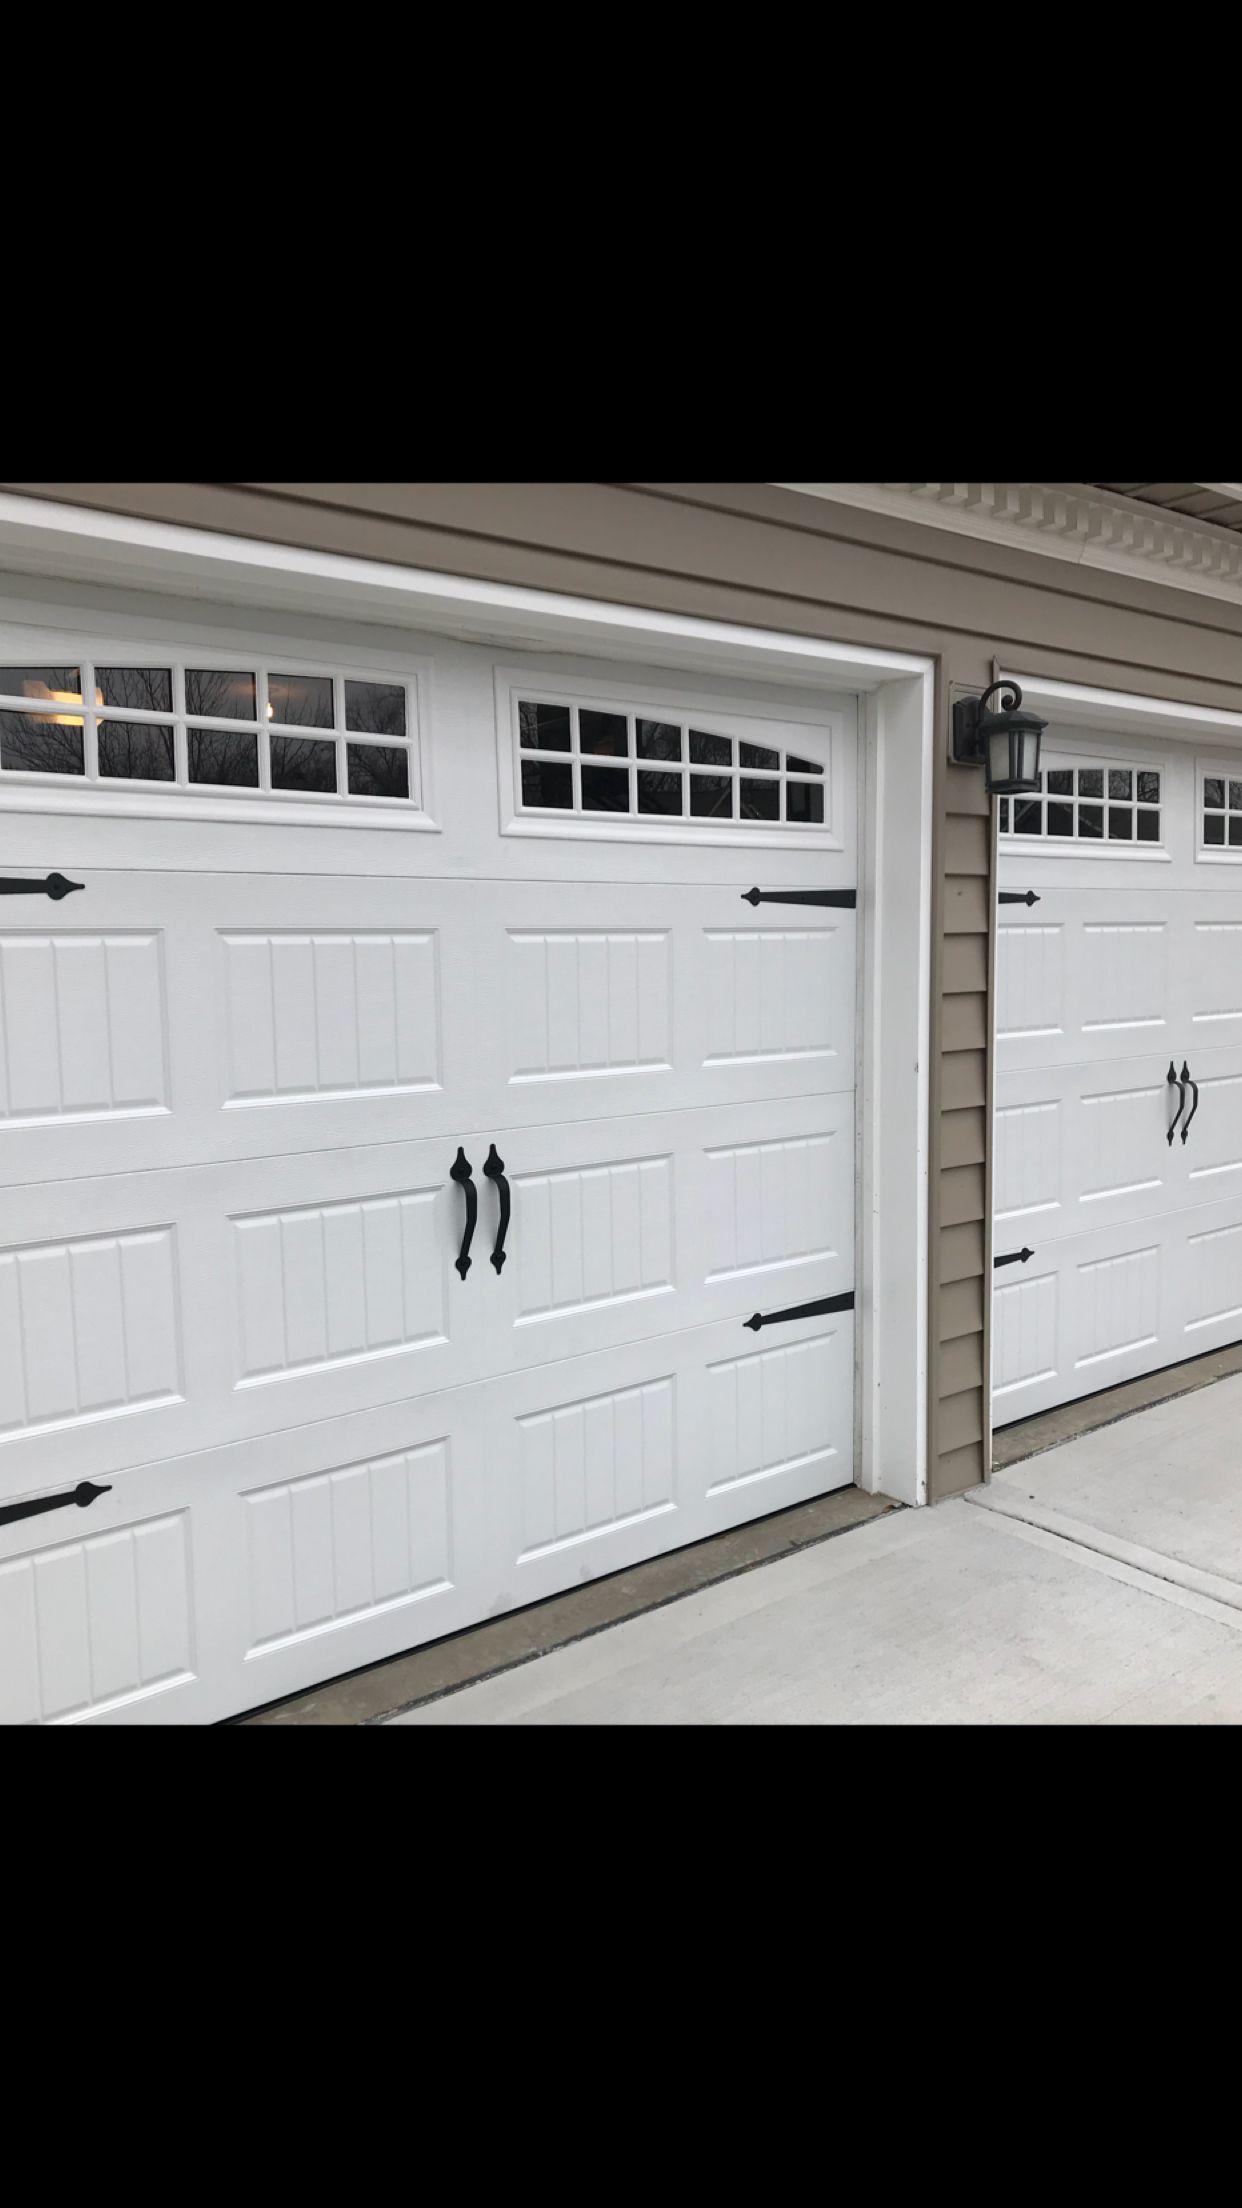 Beautiful White Carriage Style Garage Door With Decorative Hardware And Moonlite Long Panel Wind Garage Doors Carriage Style Garage Doors Carriage Garage Doors